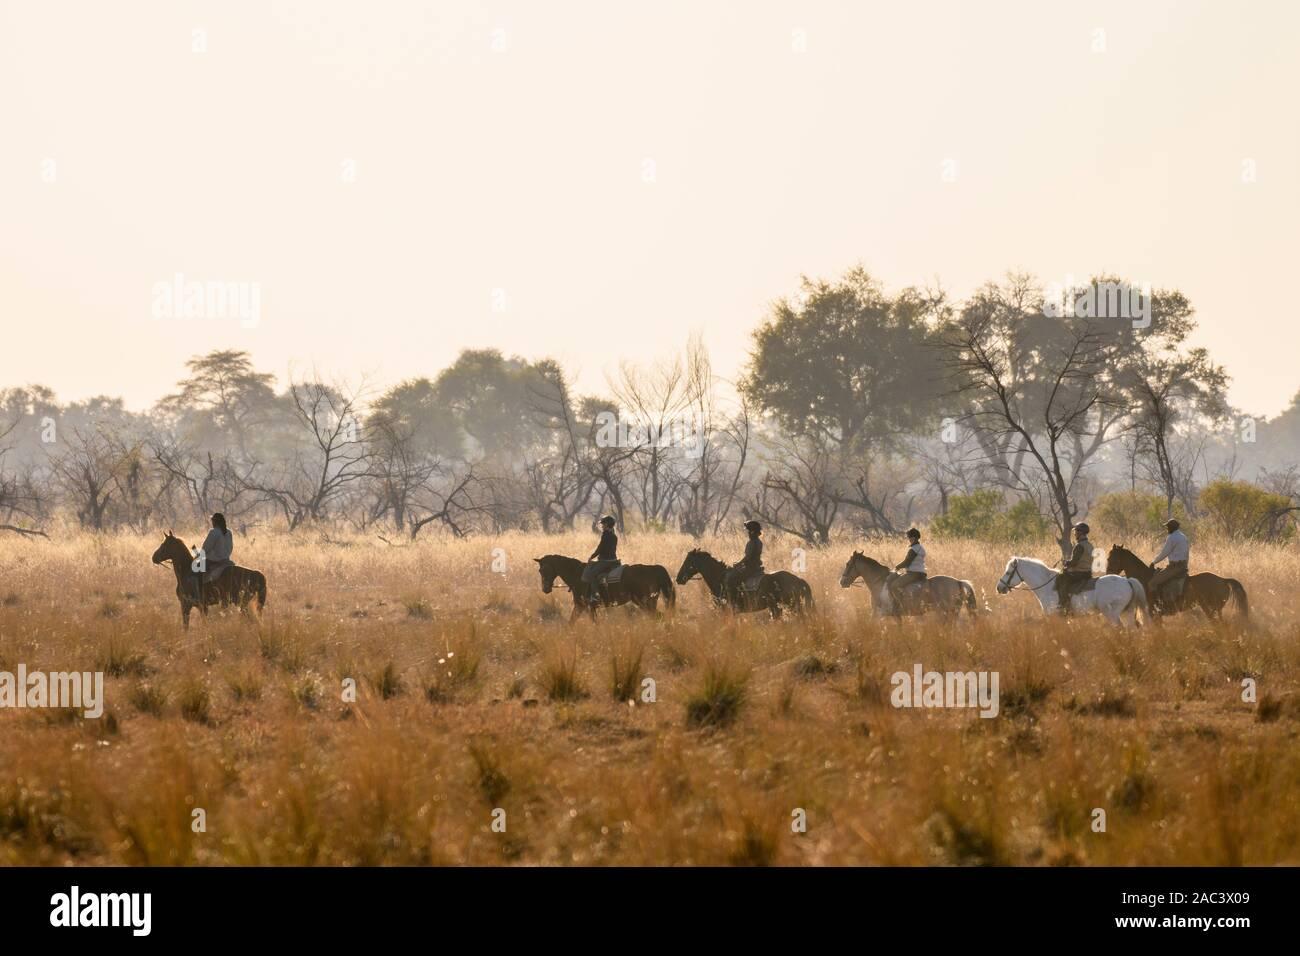 Horseback safari at Macatoo, Okavango Delta, Botswana Stock Photo